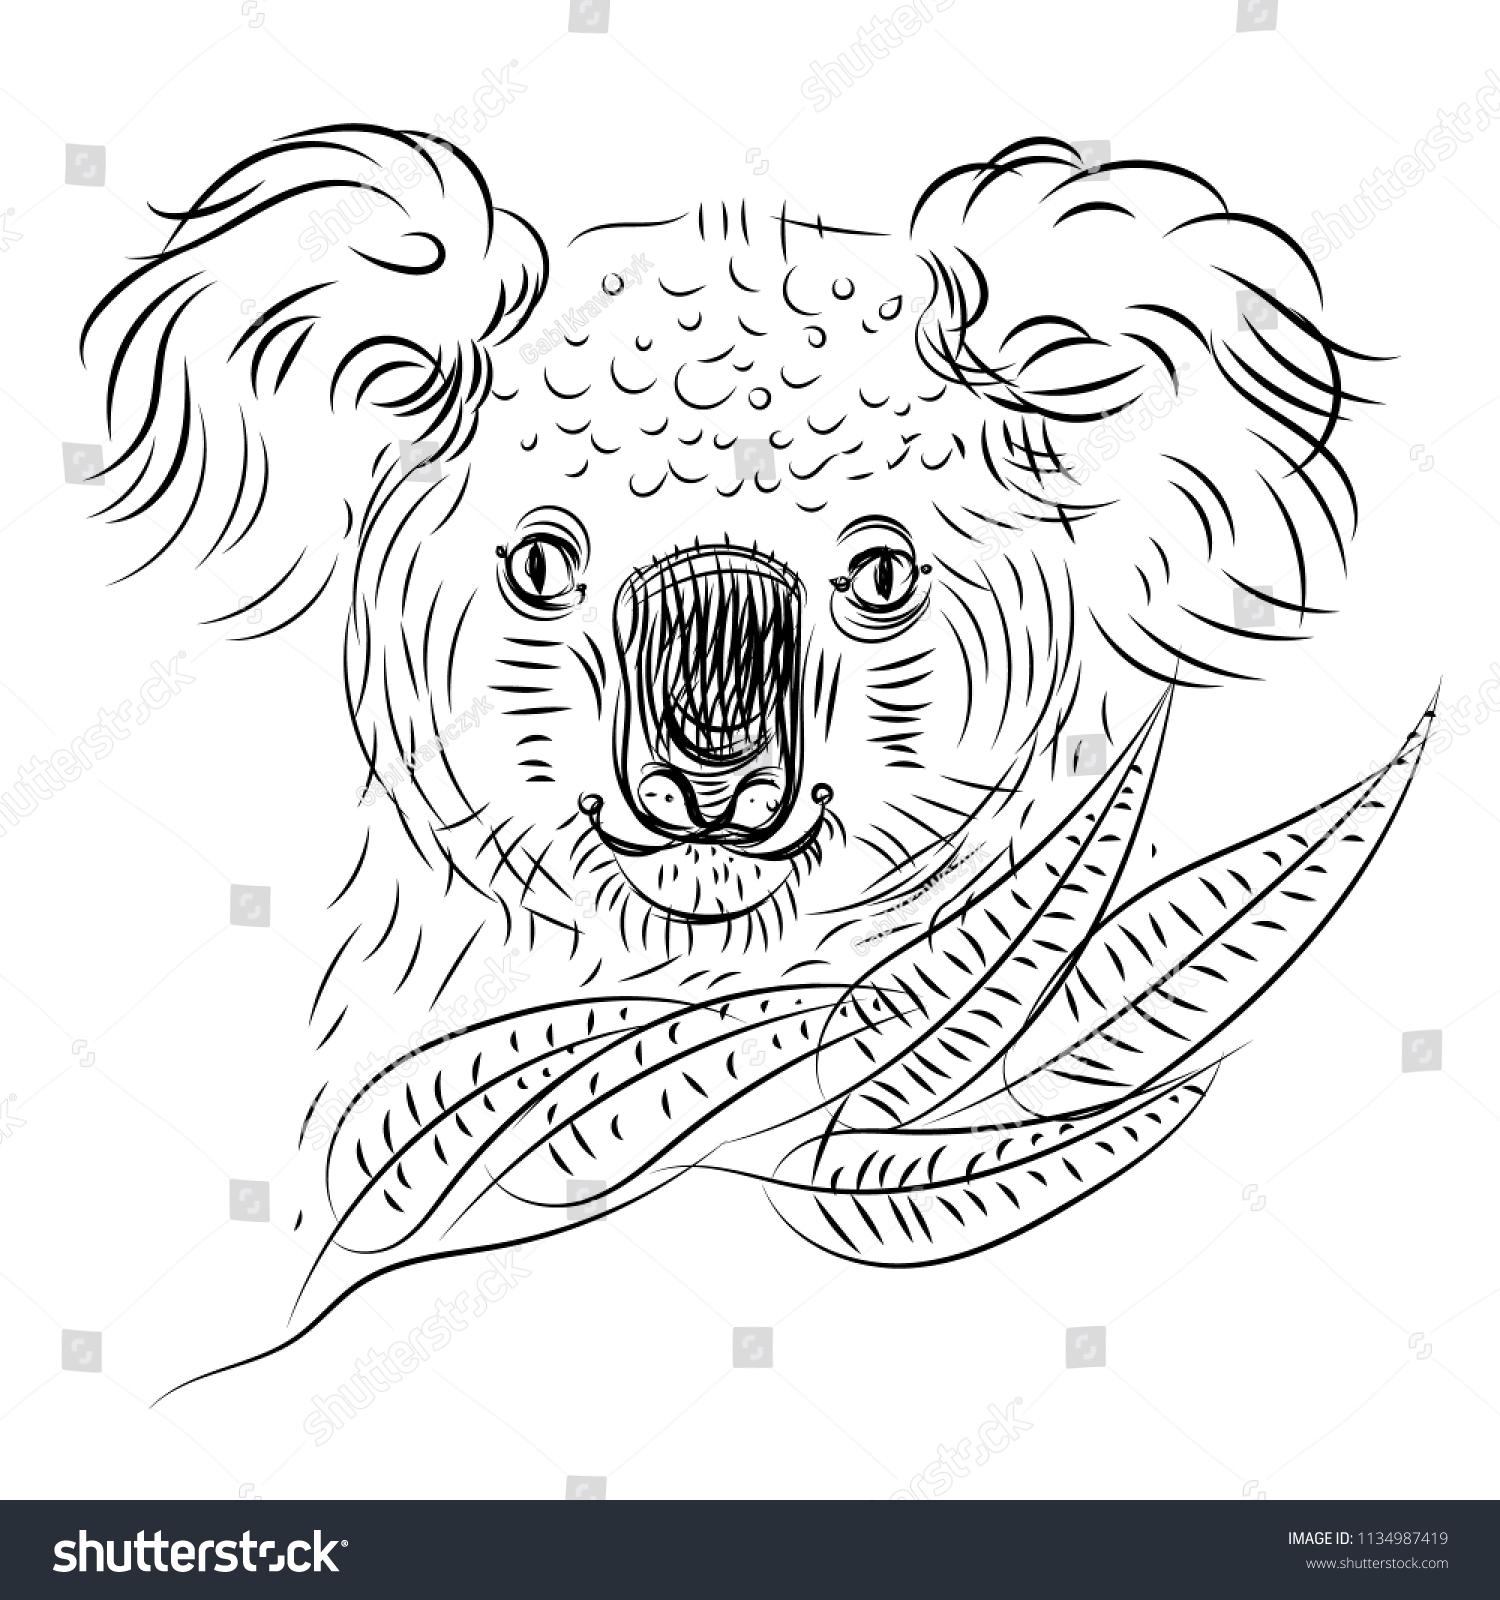 Easy Realistic Koala Drawings Www Topsimages Com